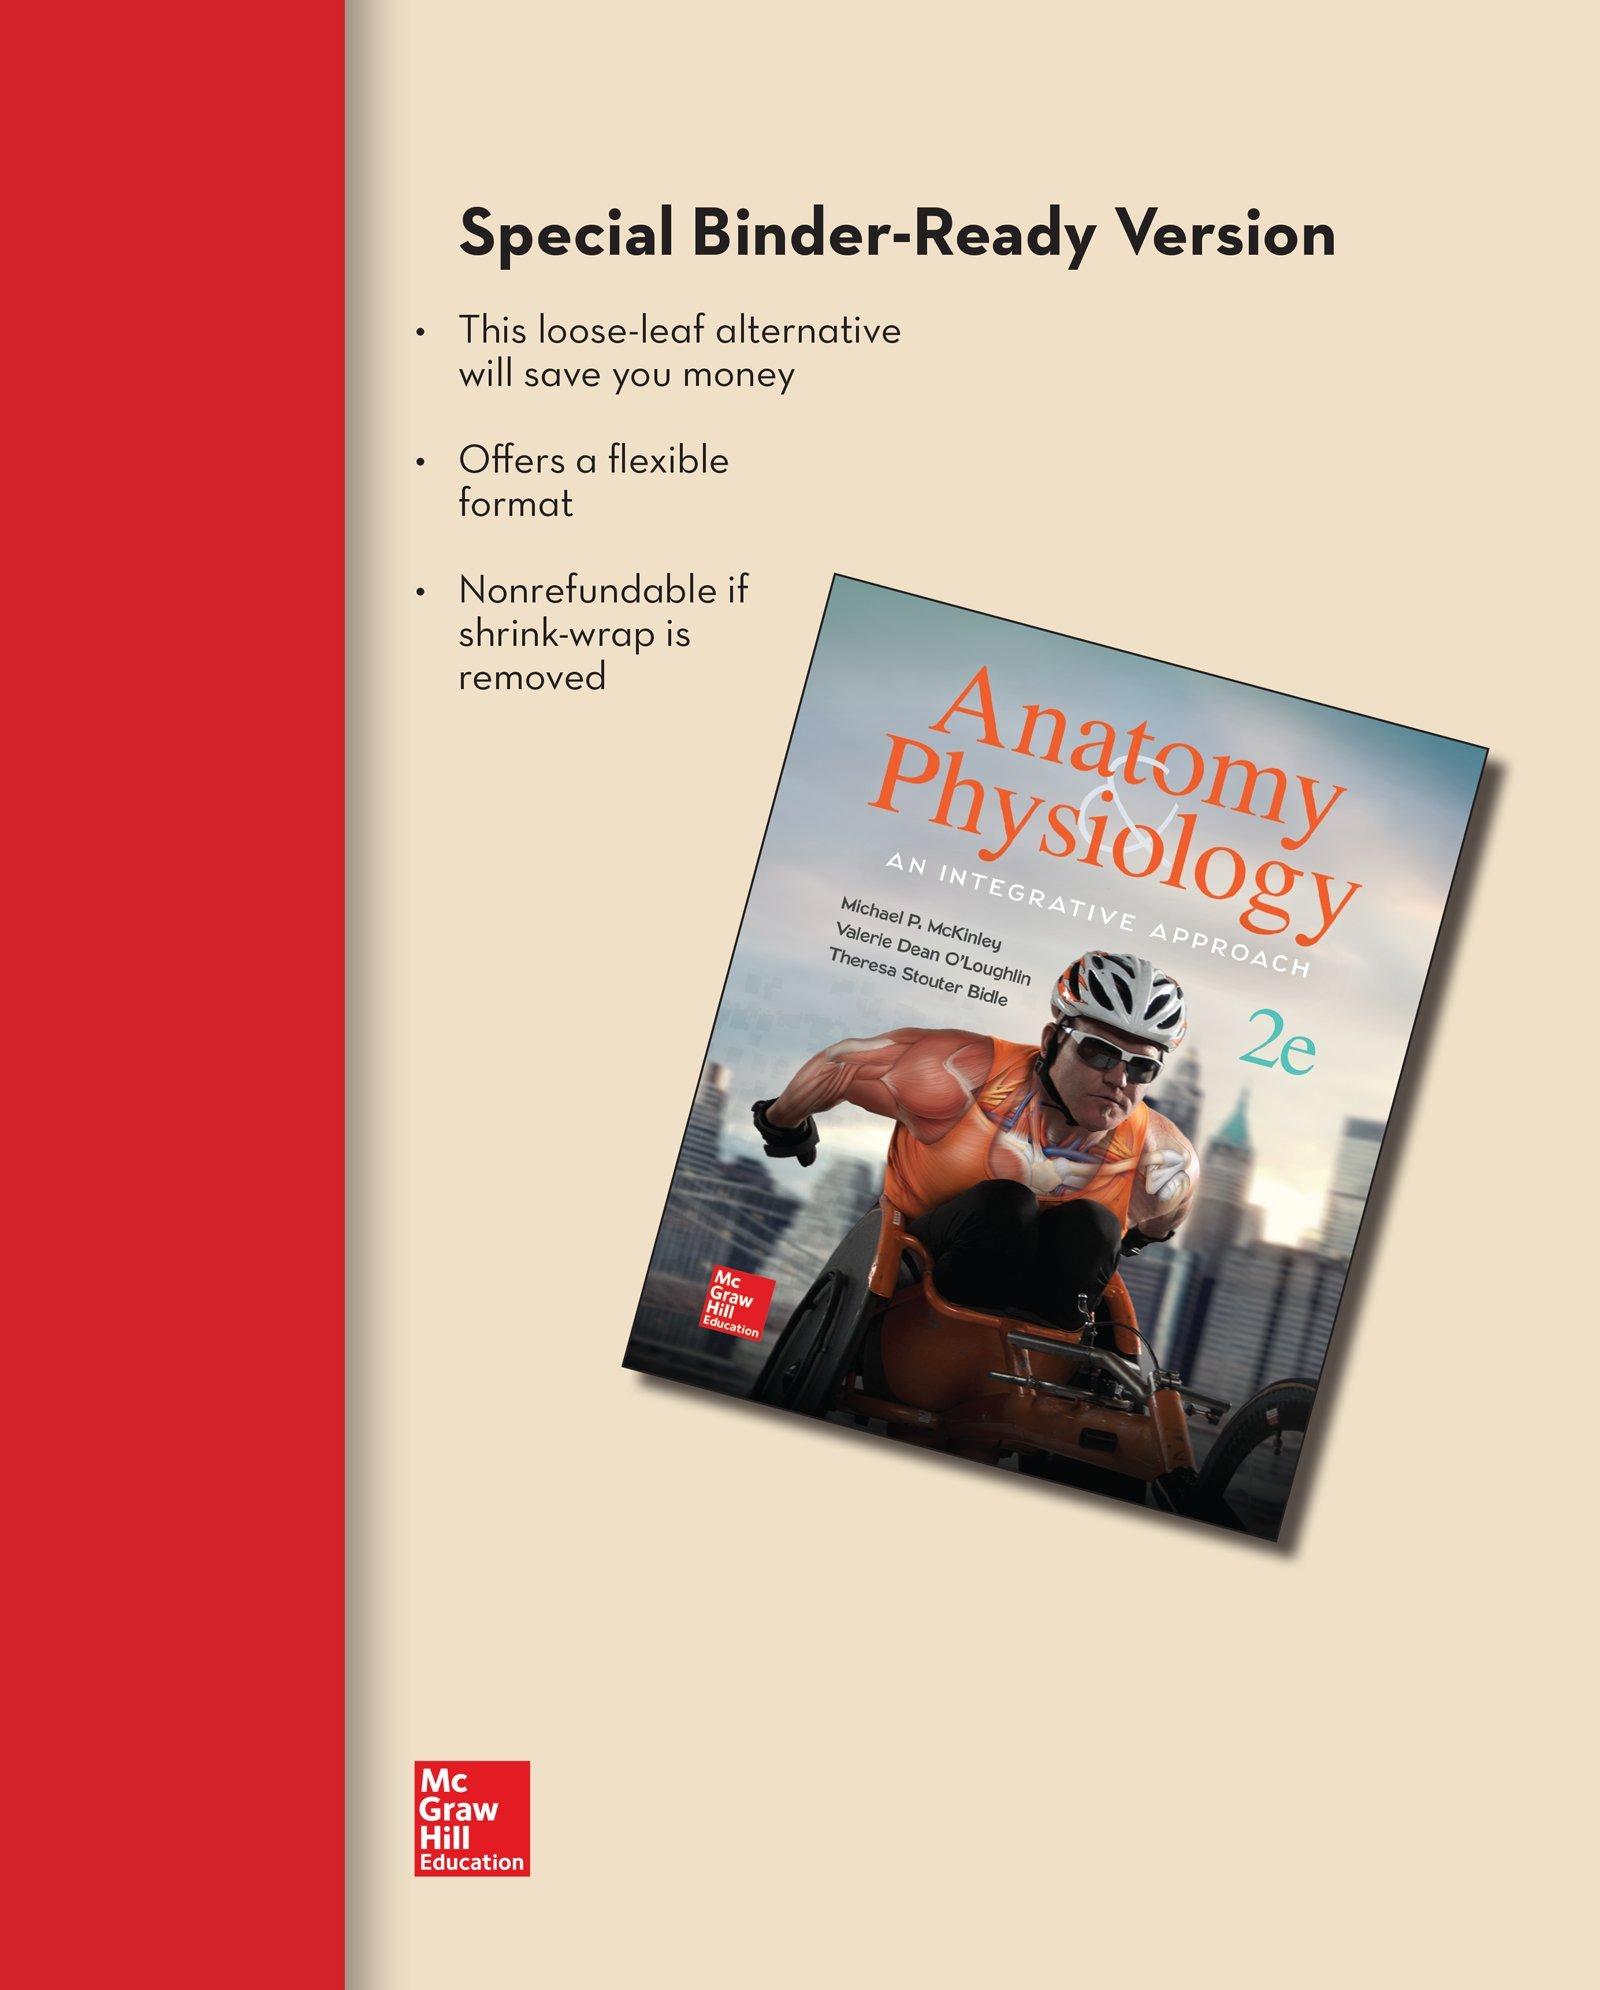 Anatomy & Physiology: An Integrative Approach: Michael P. McKinley ...